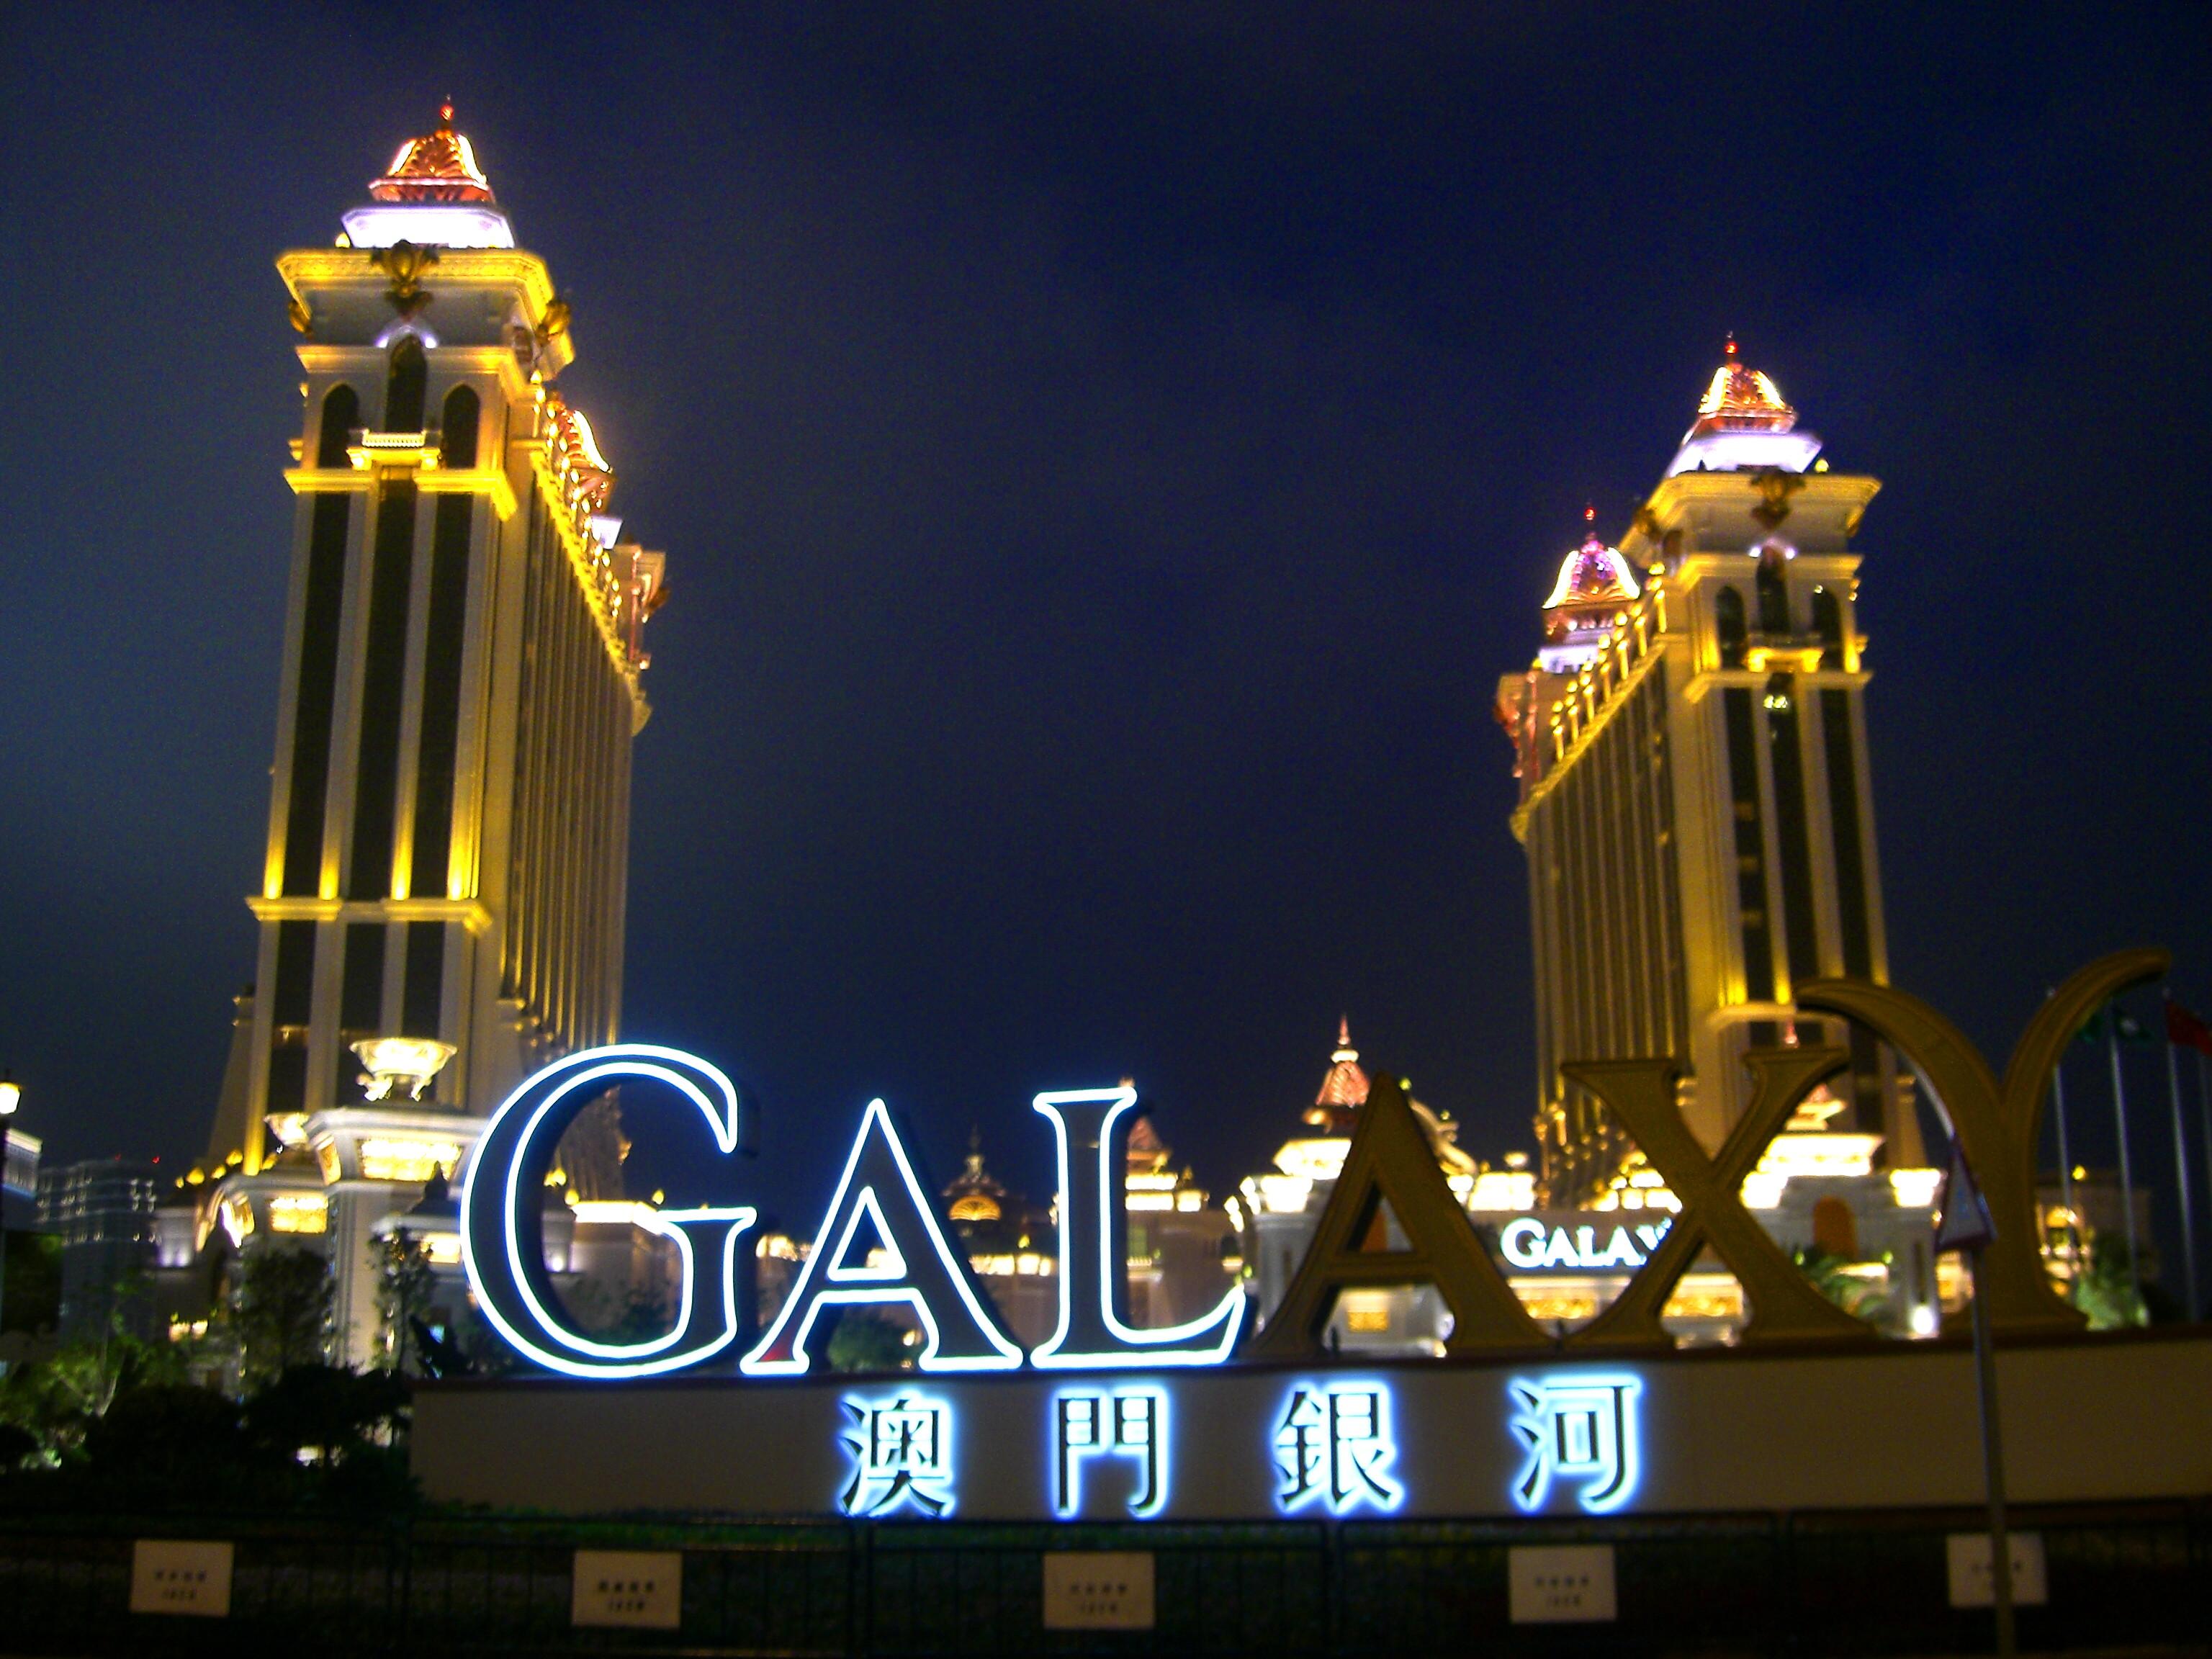 Galaxy Macao